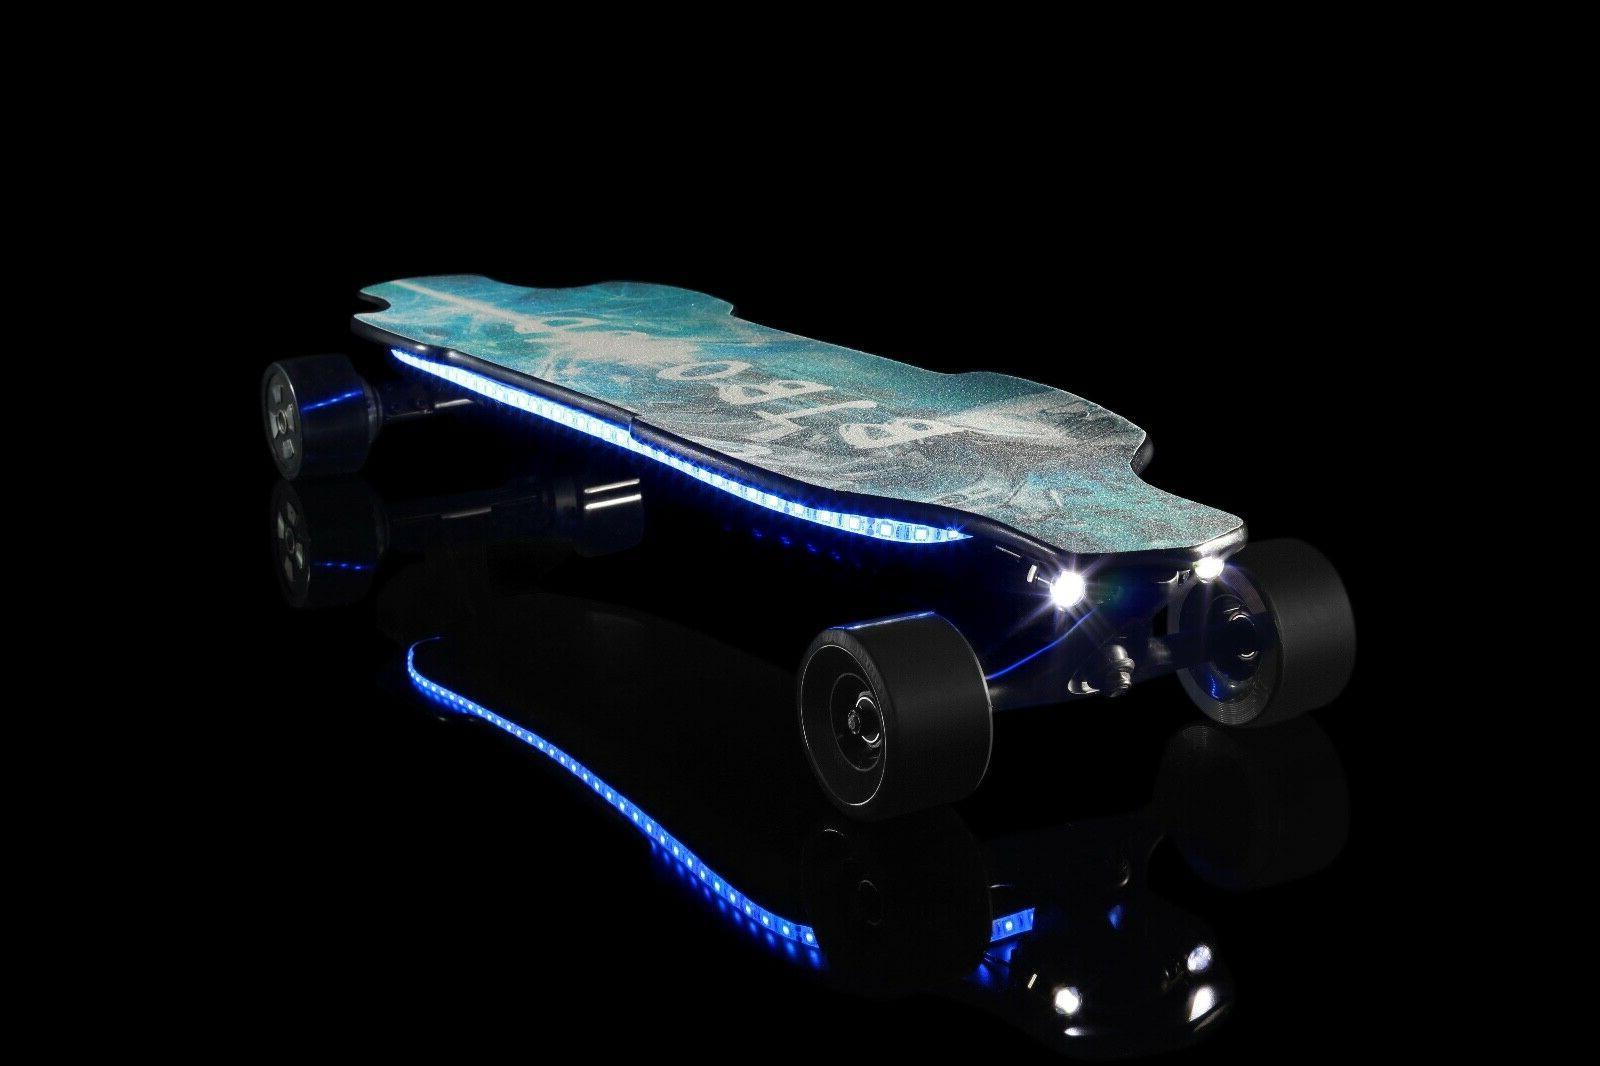 B1 Skateboard-Dual 1200W-28MPH-25mile-with LED Lights-9.6Ah